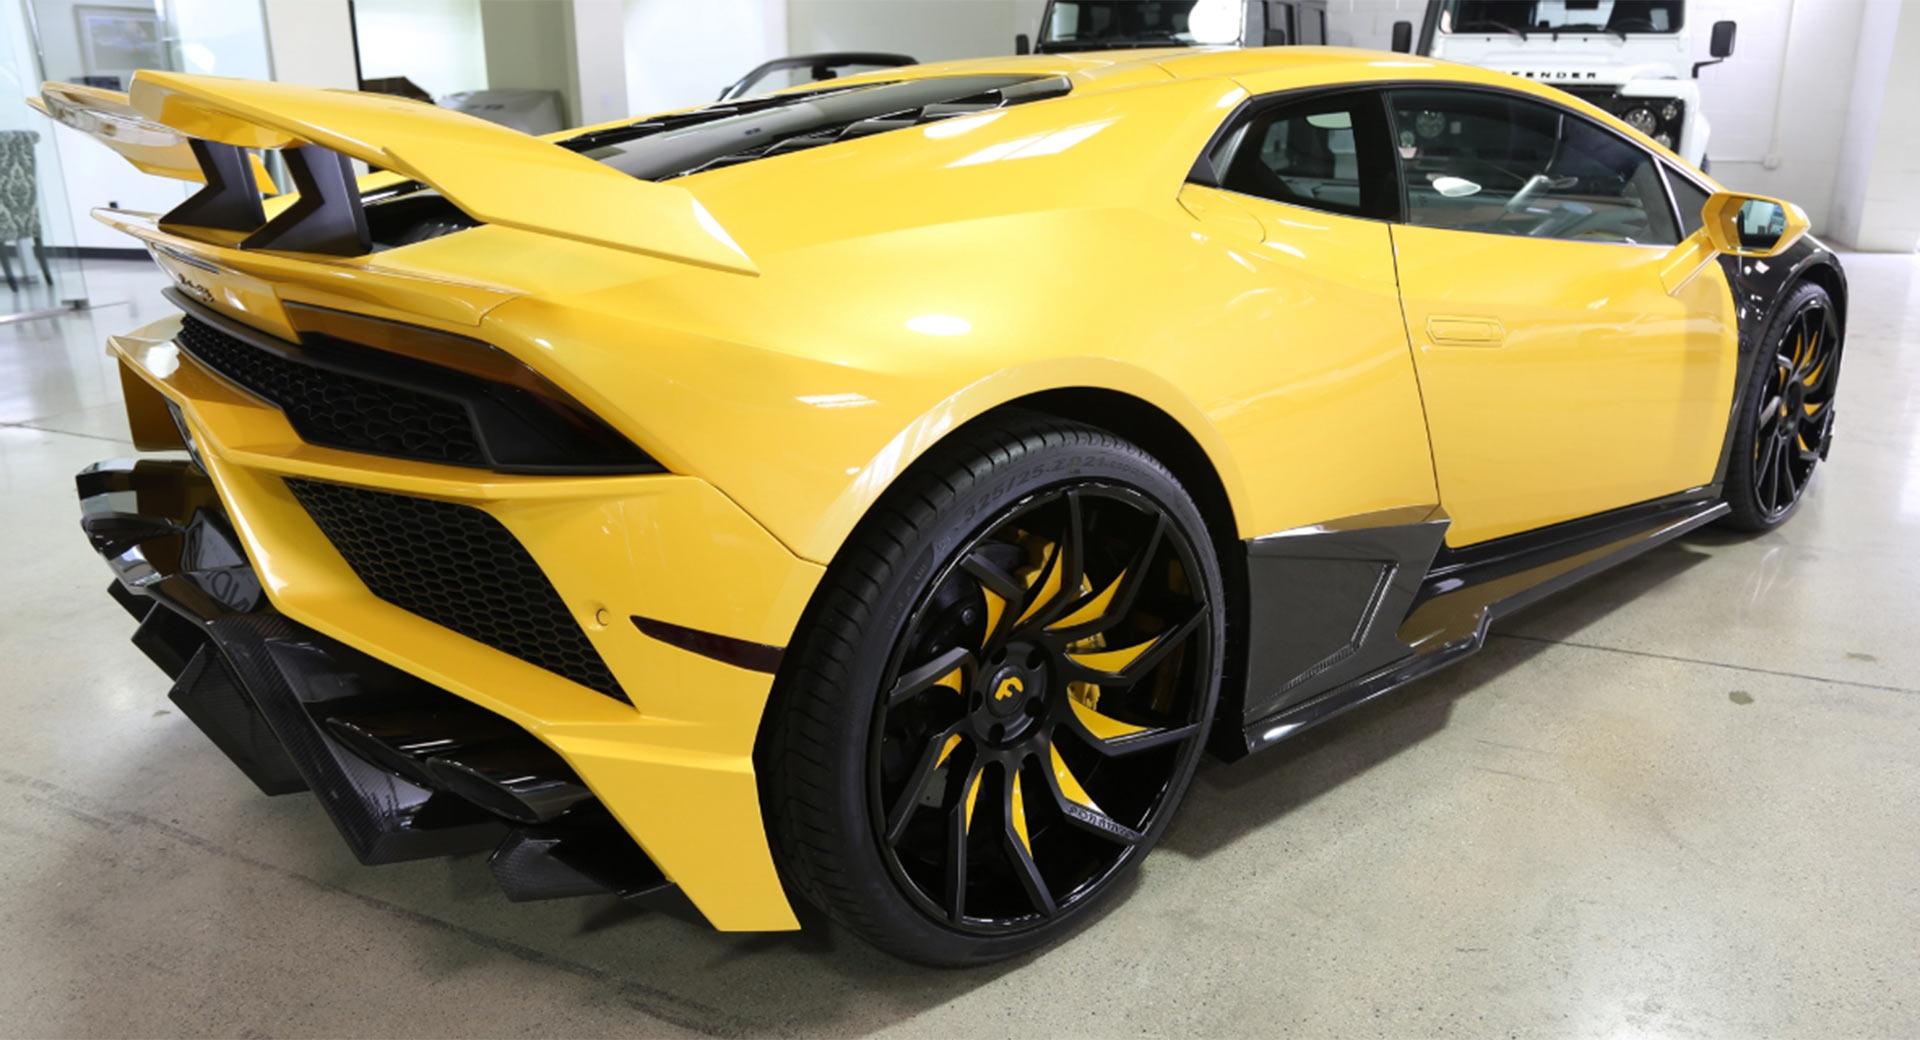 Carbon-bodykit-Lamborghini-Huracan-Fusion-Motor-2